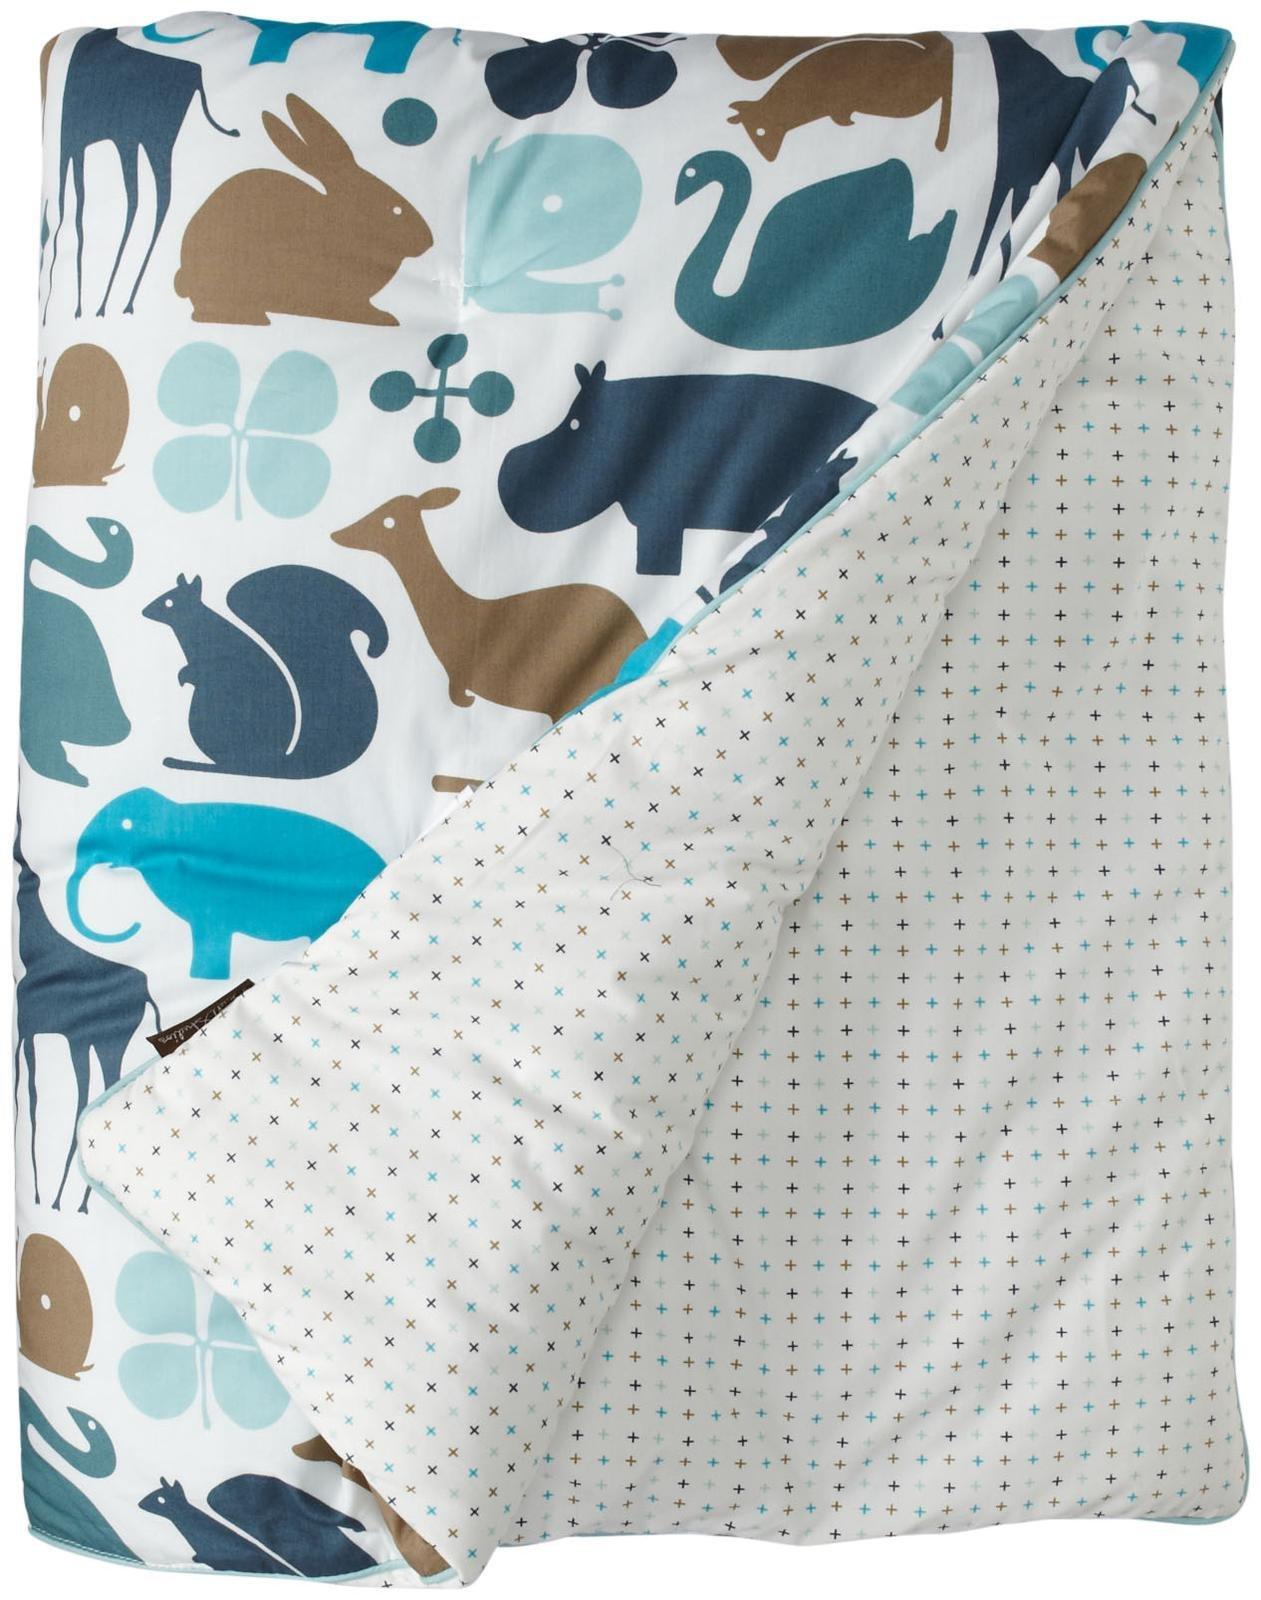 Gio Play Blanket- Aqua